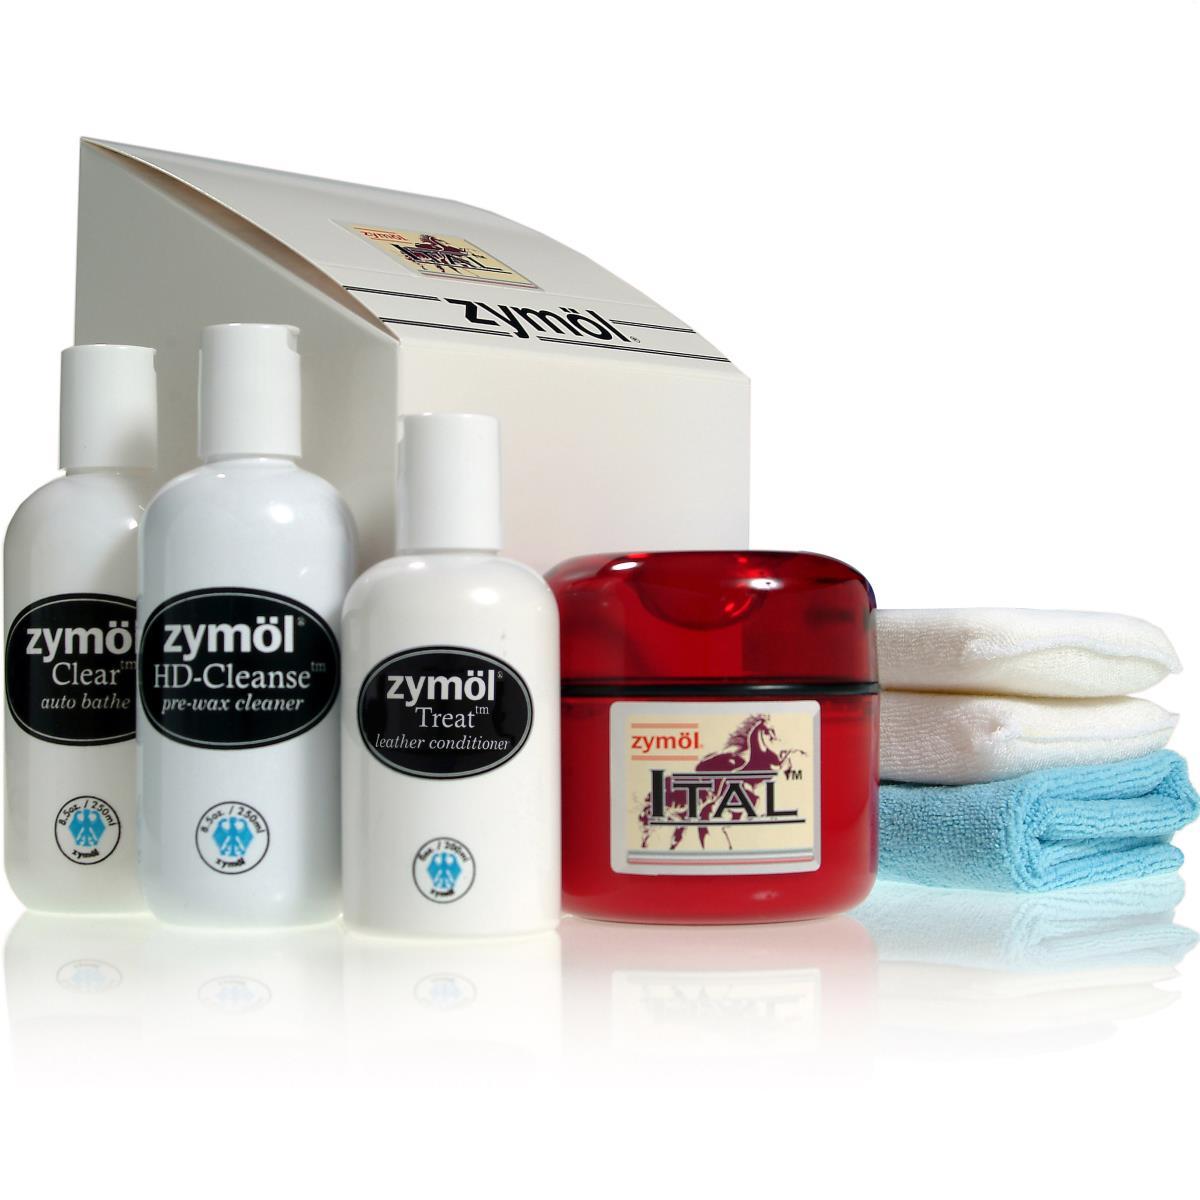 Zymol Starter Kits